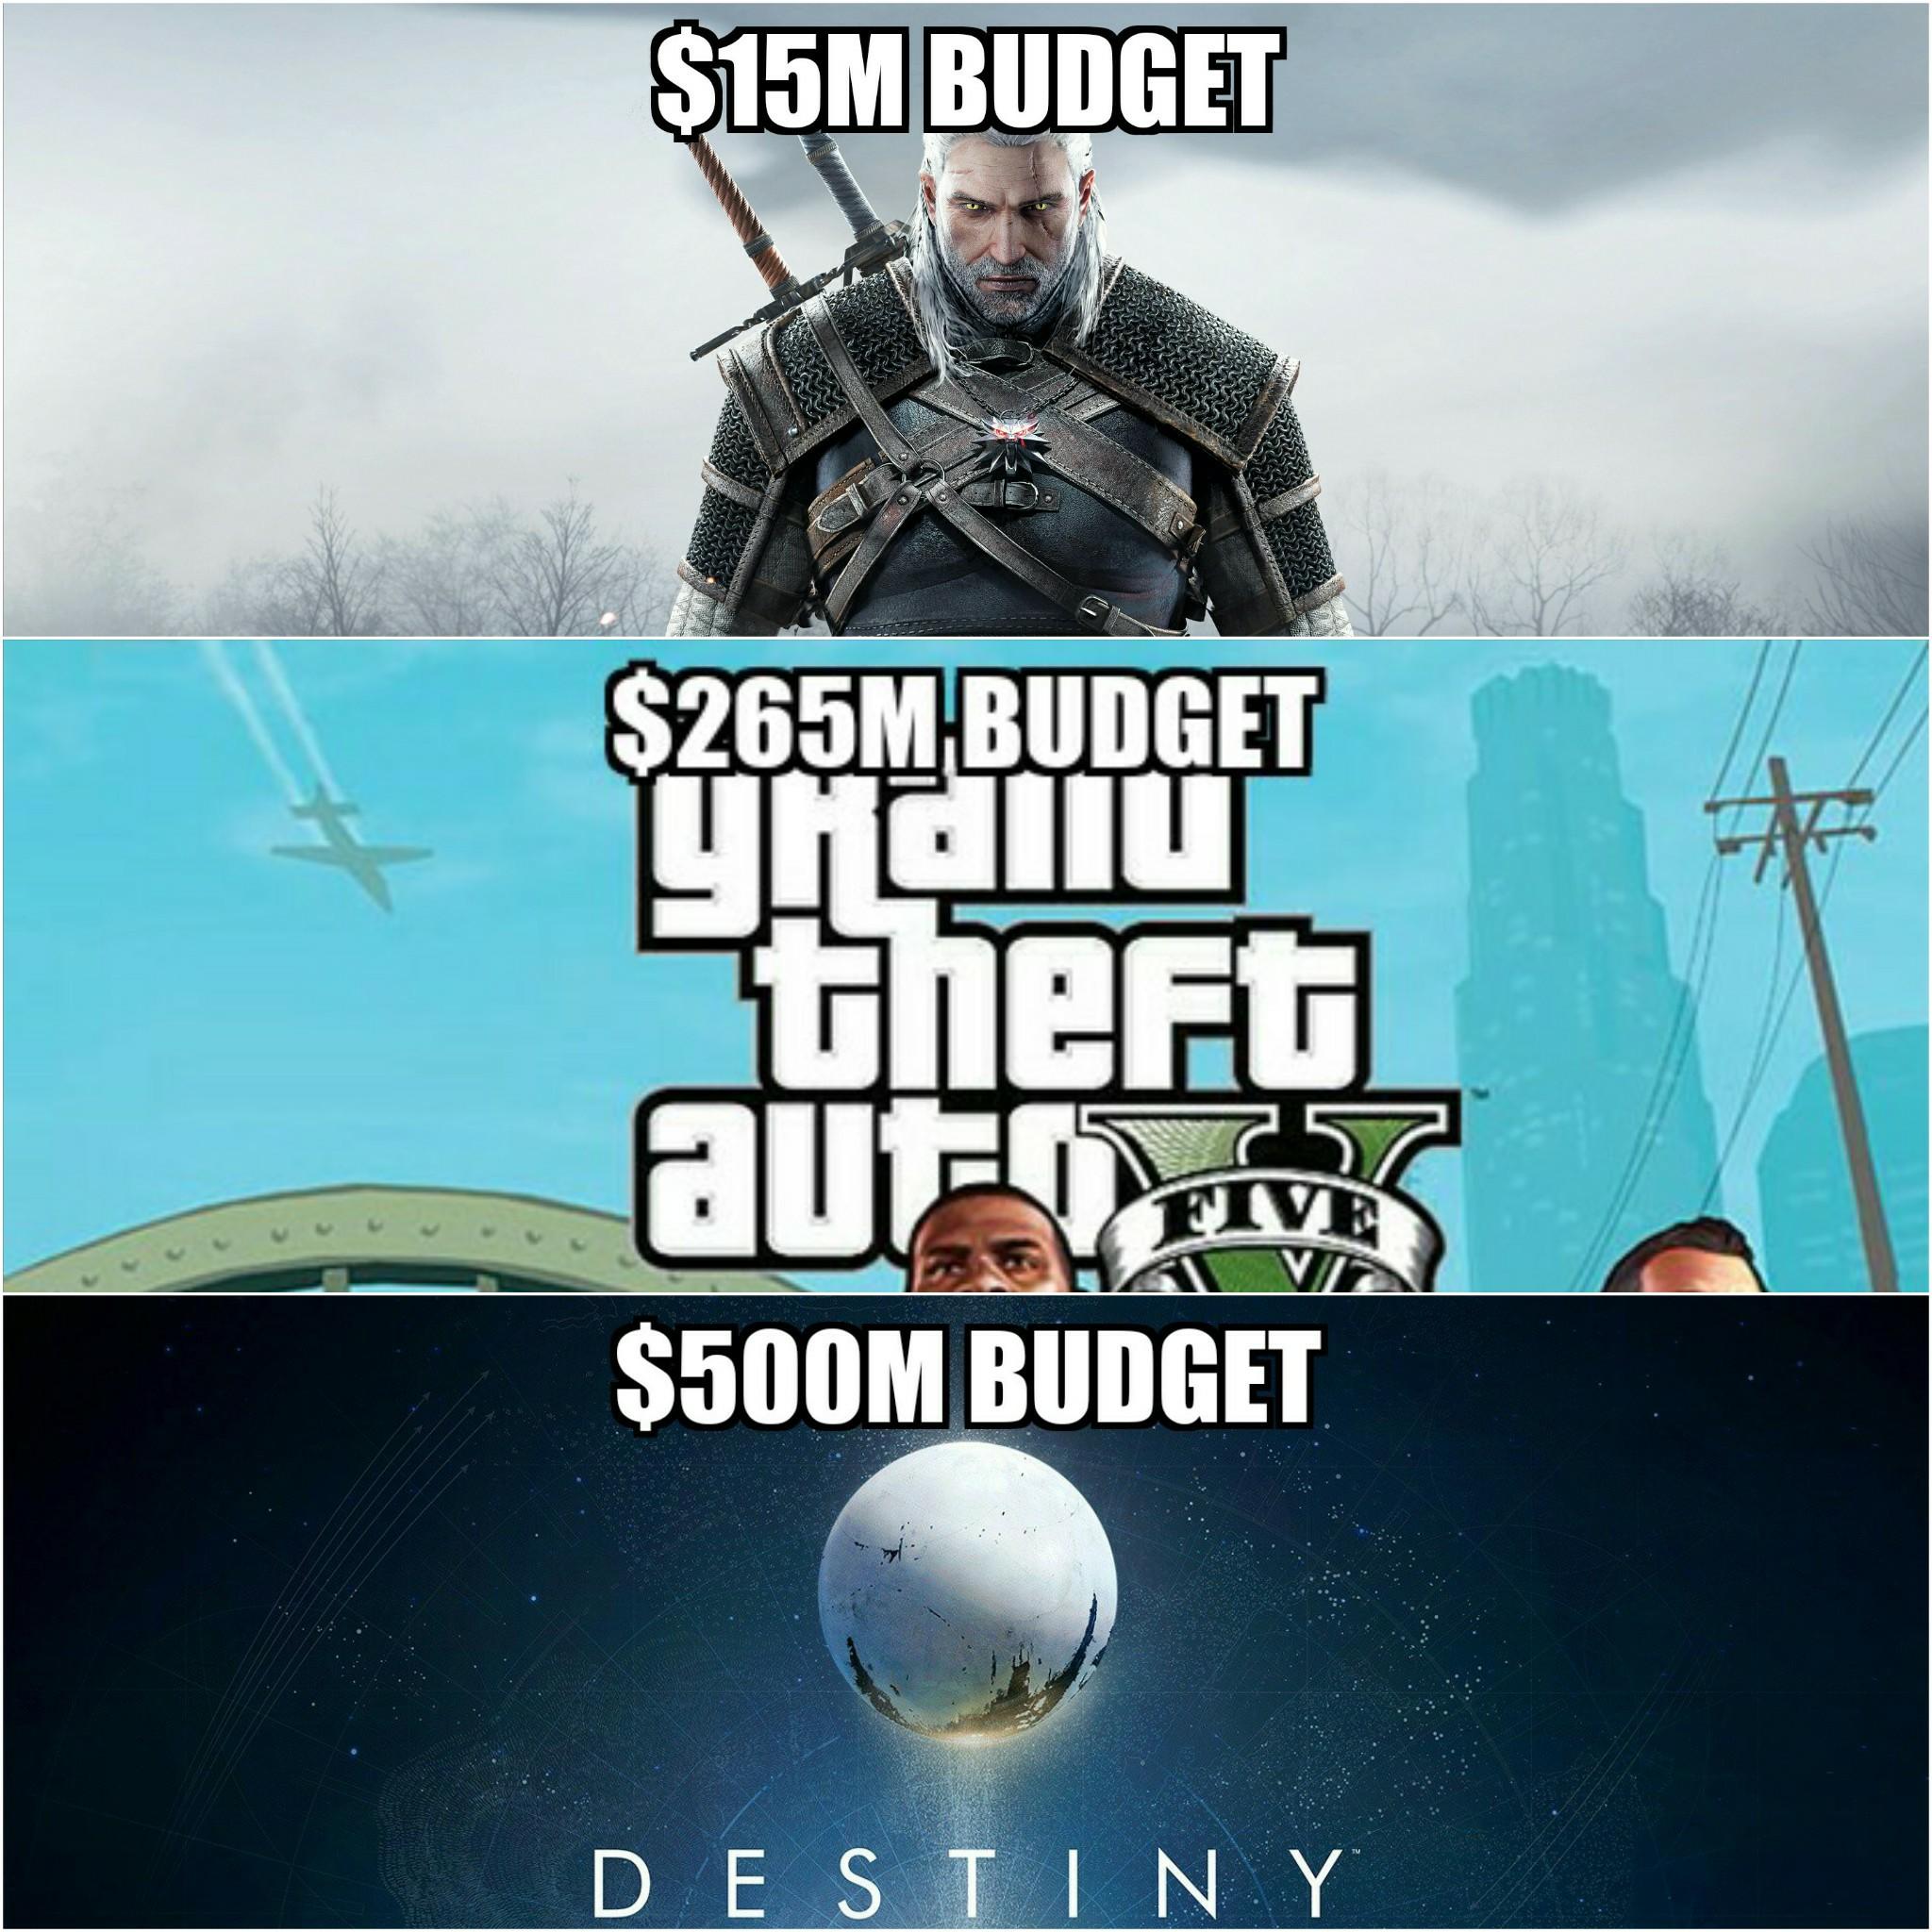 A mi smo samo hteli da igramo video igre